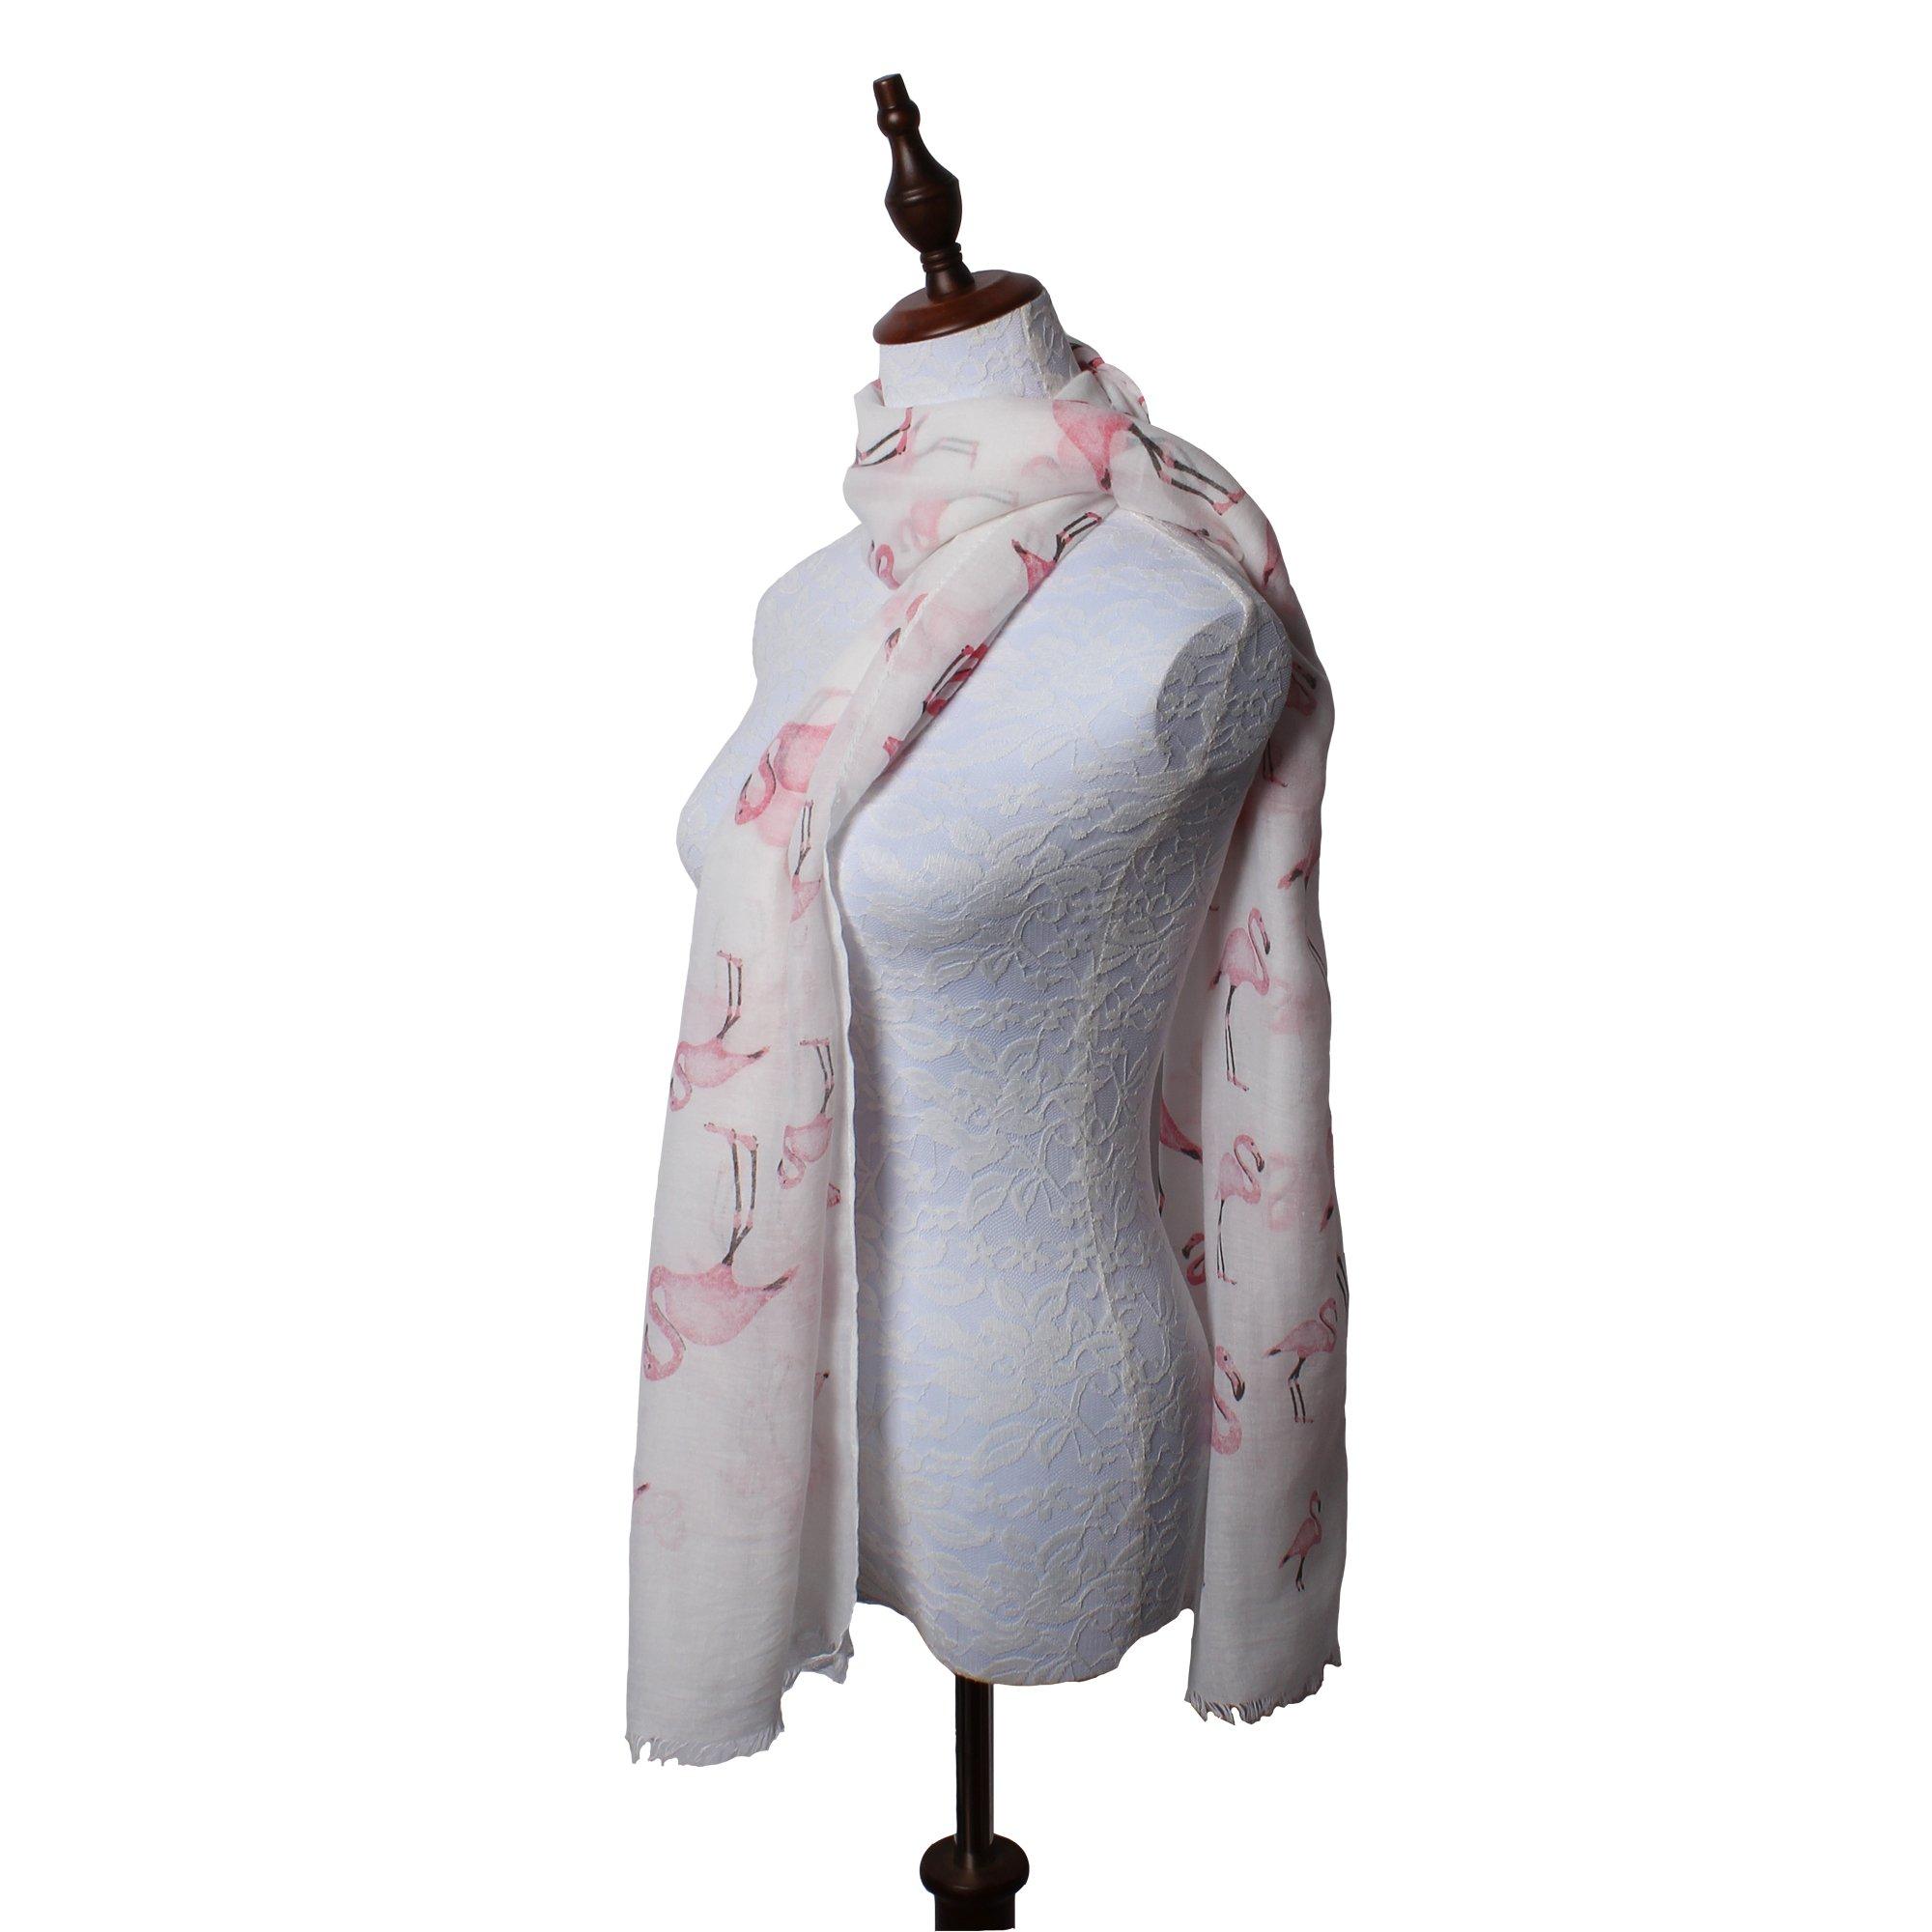 daguanjing 【Colorful Spring Inspired】 Women's Lightweight Fashion Scarf, Floral and Modern Print Sheer Shawl Wrap Flamingo by daguanjing (Image #3)